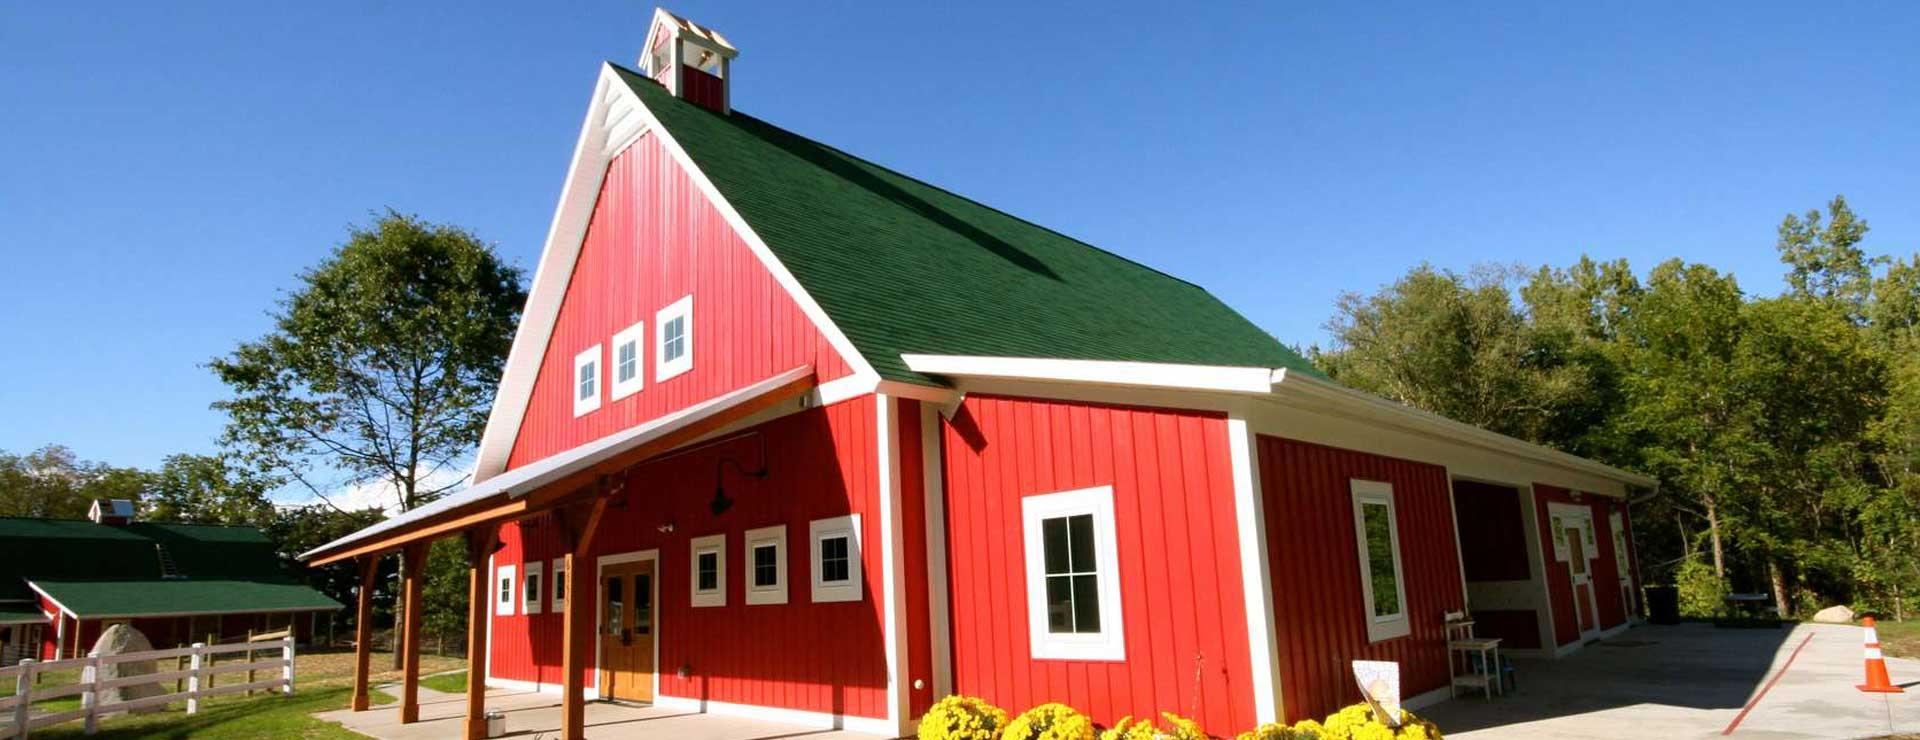 canterbury-creek-farm-preschool-grand-rapids-mi-school-barn